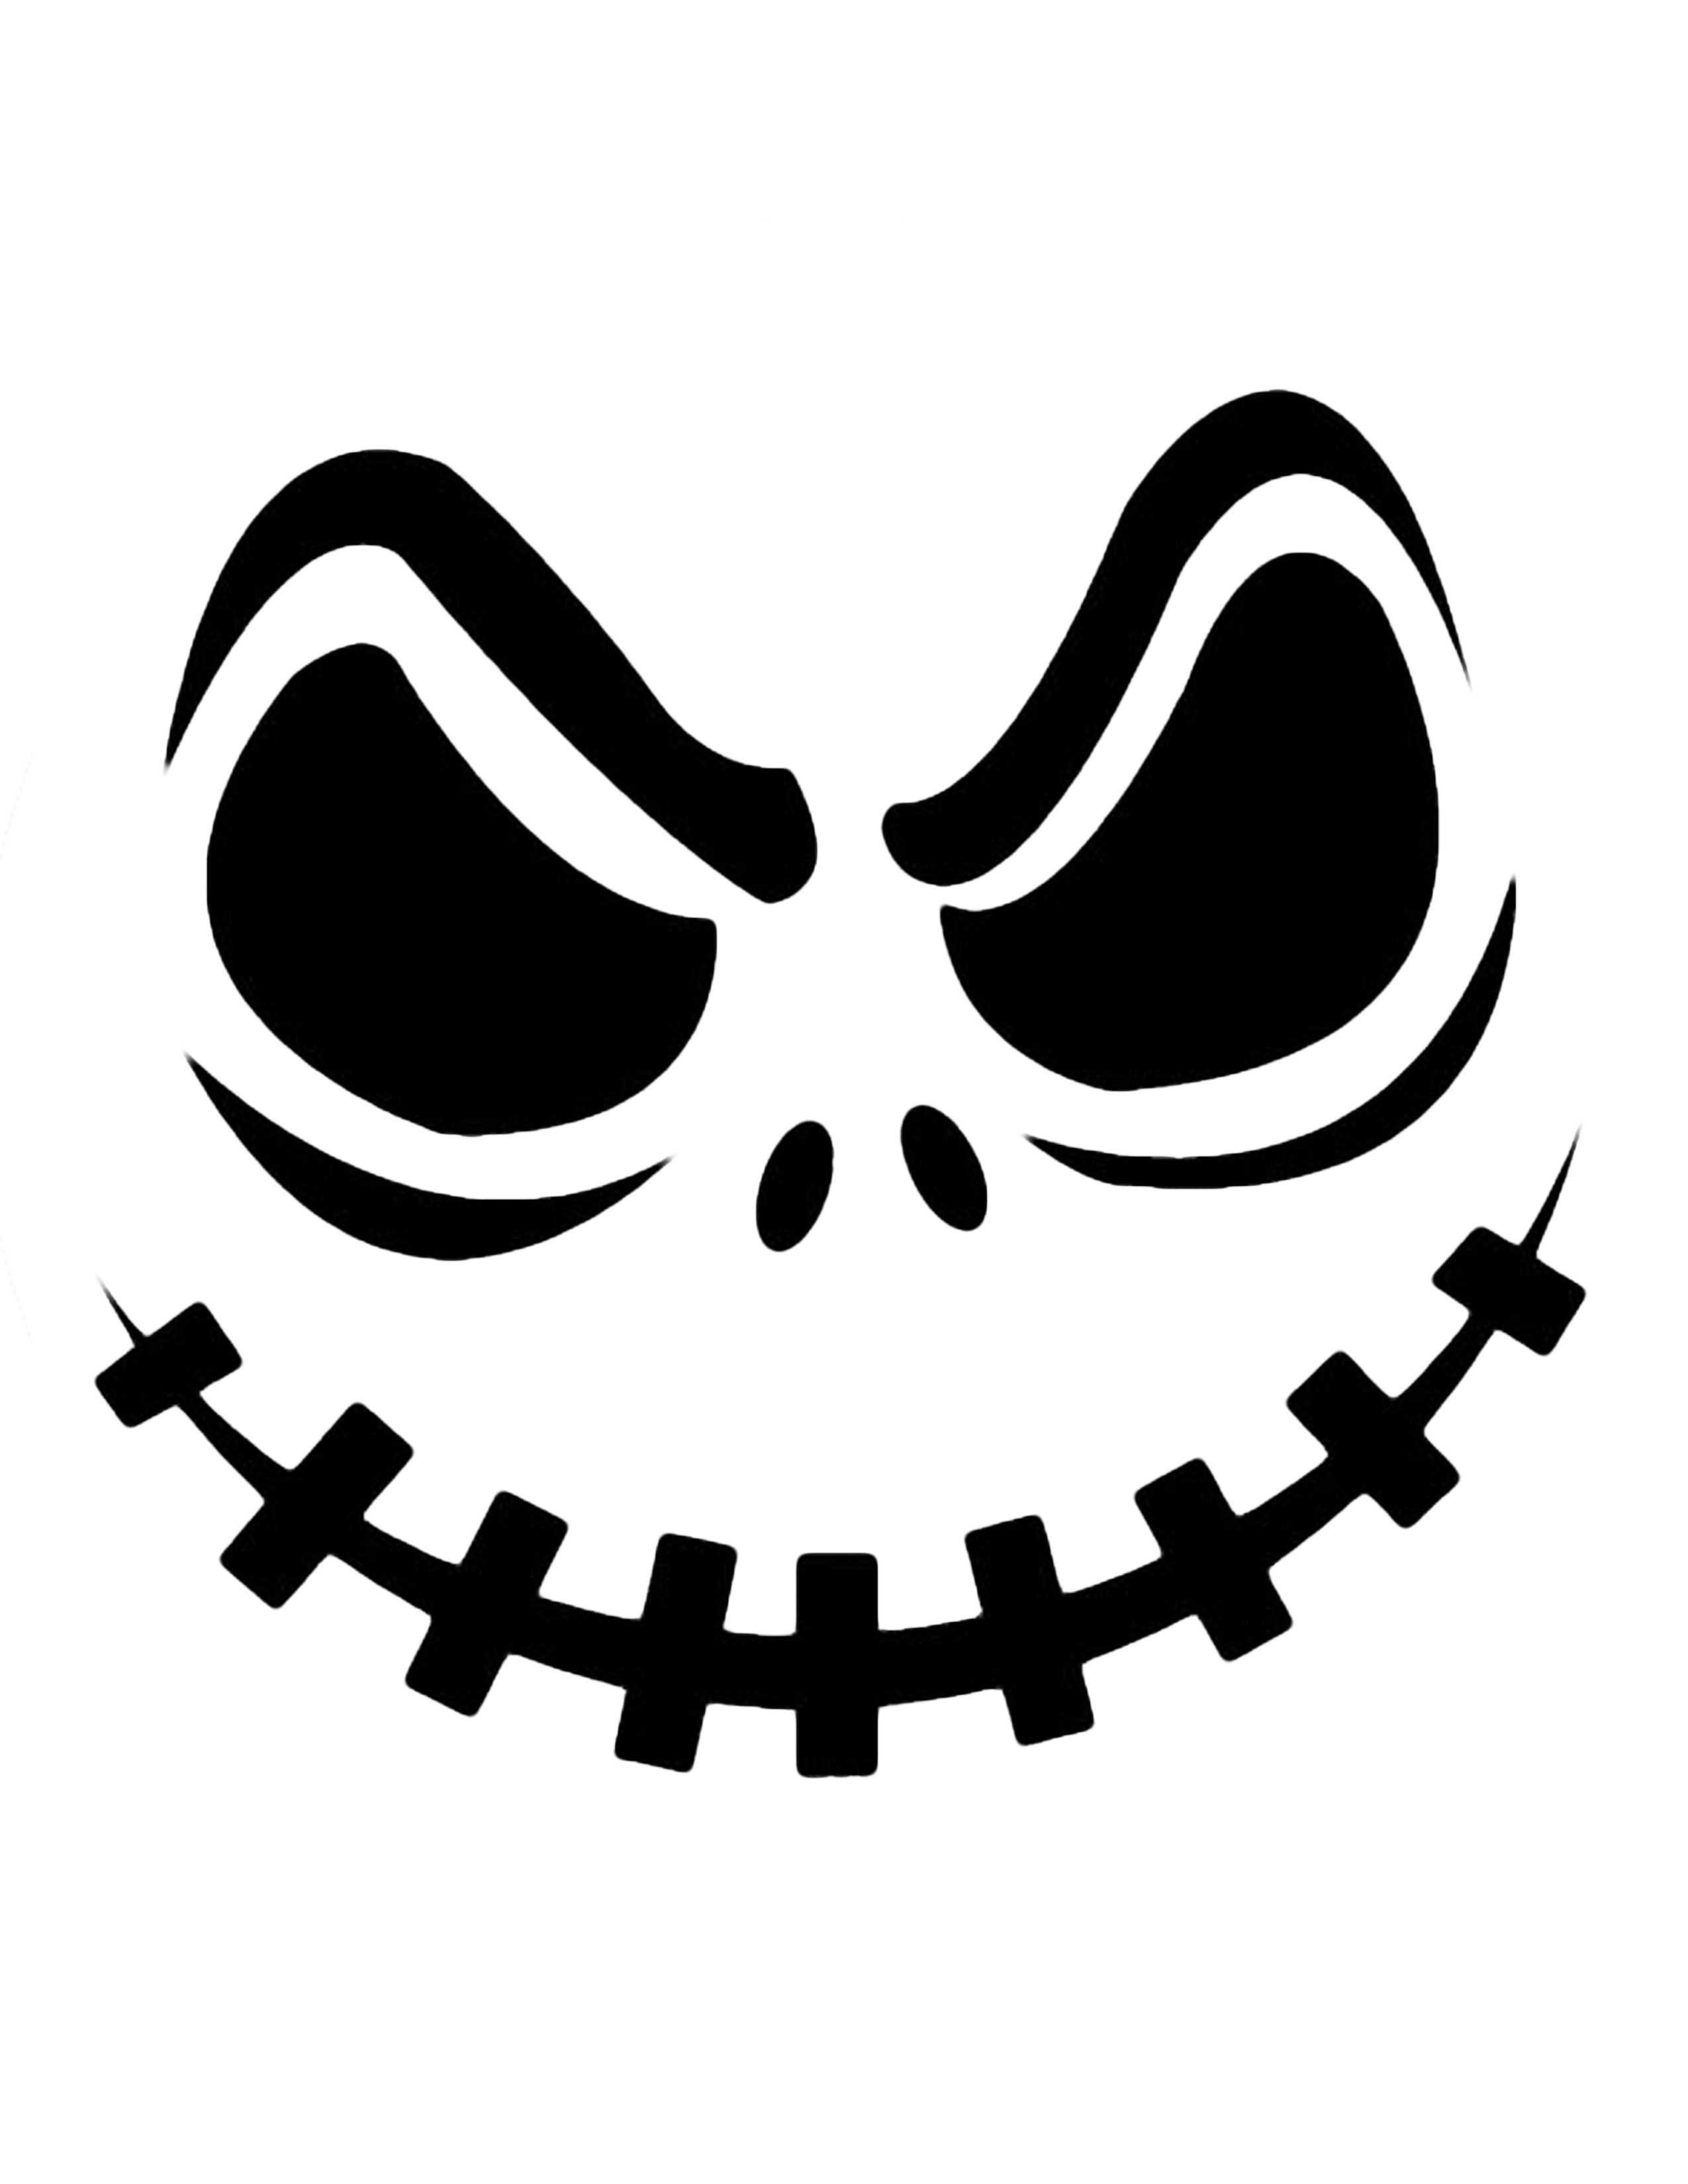 Image Result For Halloween Creepy Leaves Line Art Kostenlose Kurbis Schablonen Kurbis Stempel Kurbisgesichter